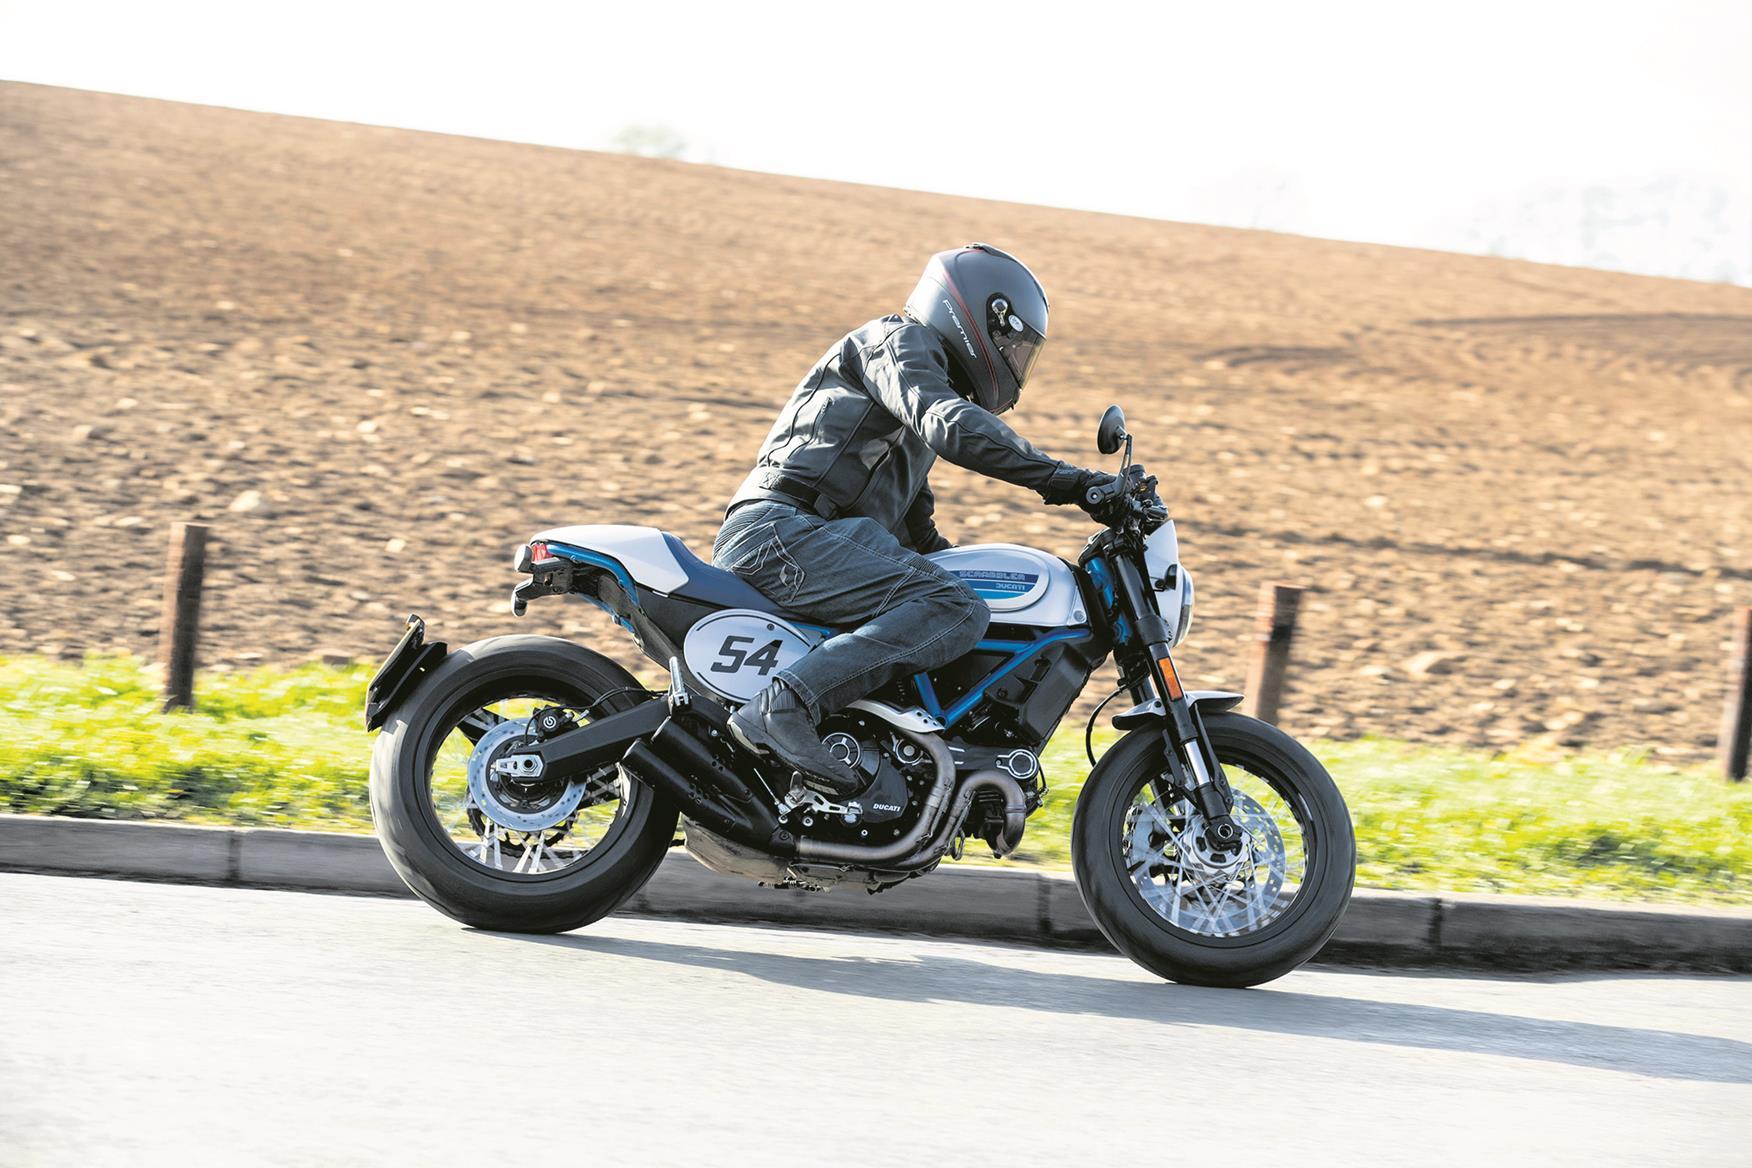 Ducati Scrambler cornering